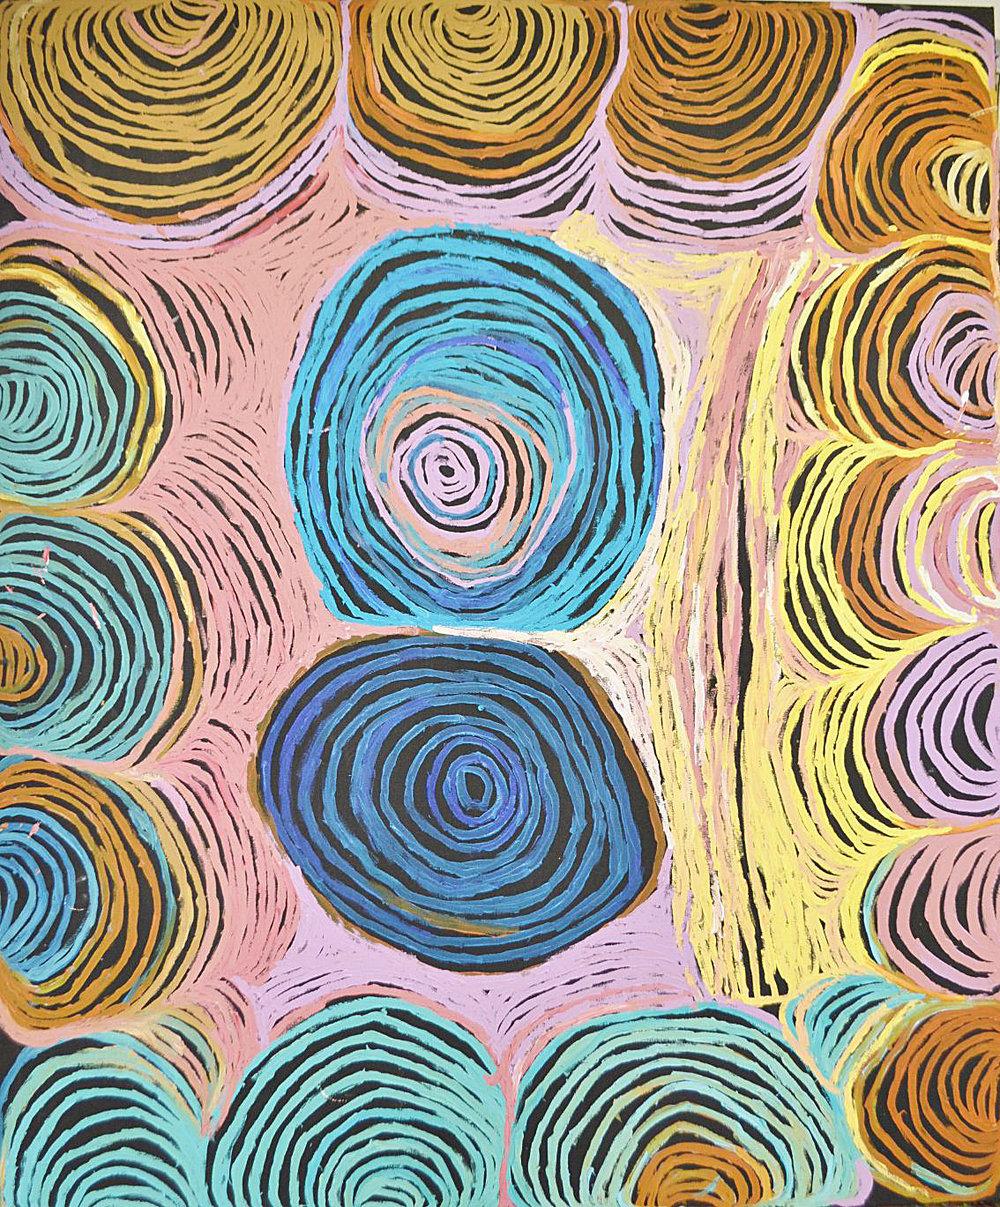 "NYARAPAYI GILES  Warmurrungu  59"" x 72"" (150 x 180 cm) Acrylic on Belgian linen Tjarlirli Artists catalog #12-306   EMAIL INQUIRY"